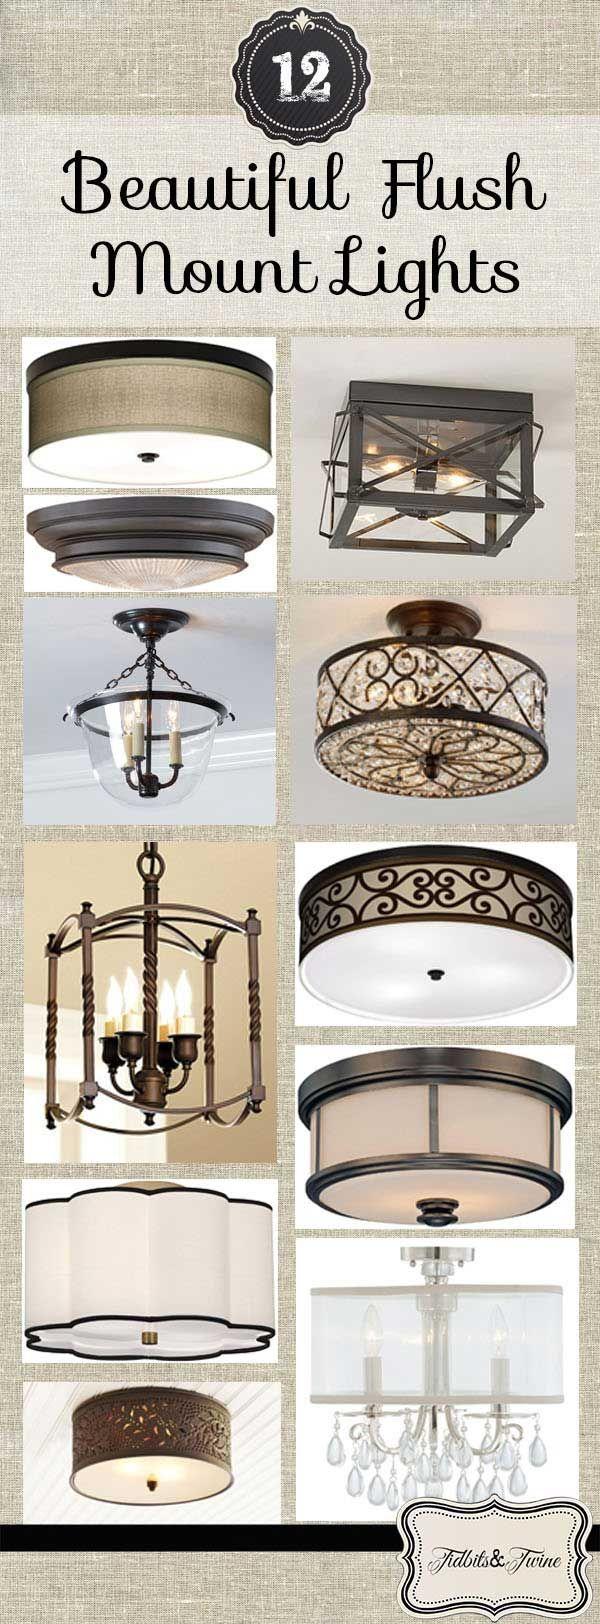 Best  Dining Room Ceiling Lights Ideas On Pinterest - Dining room lights ceiling